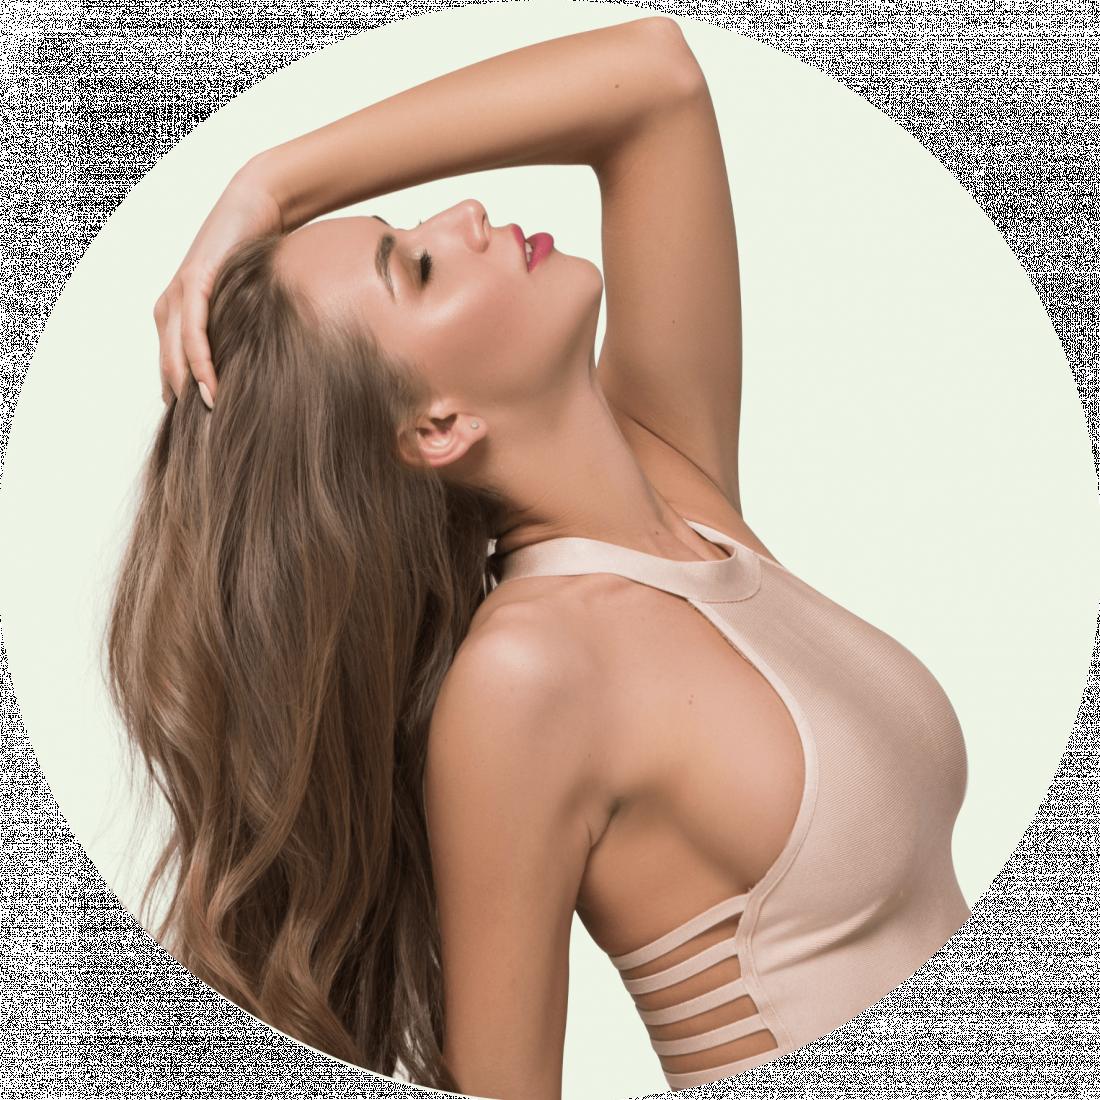 Why women choose Breast Augmentation?